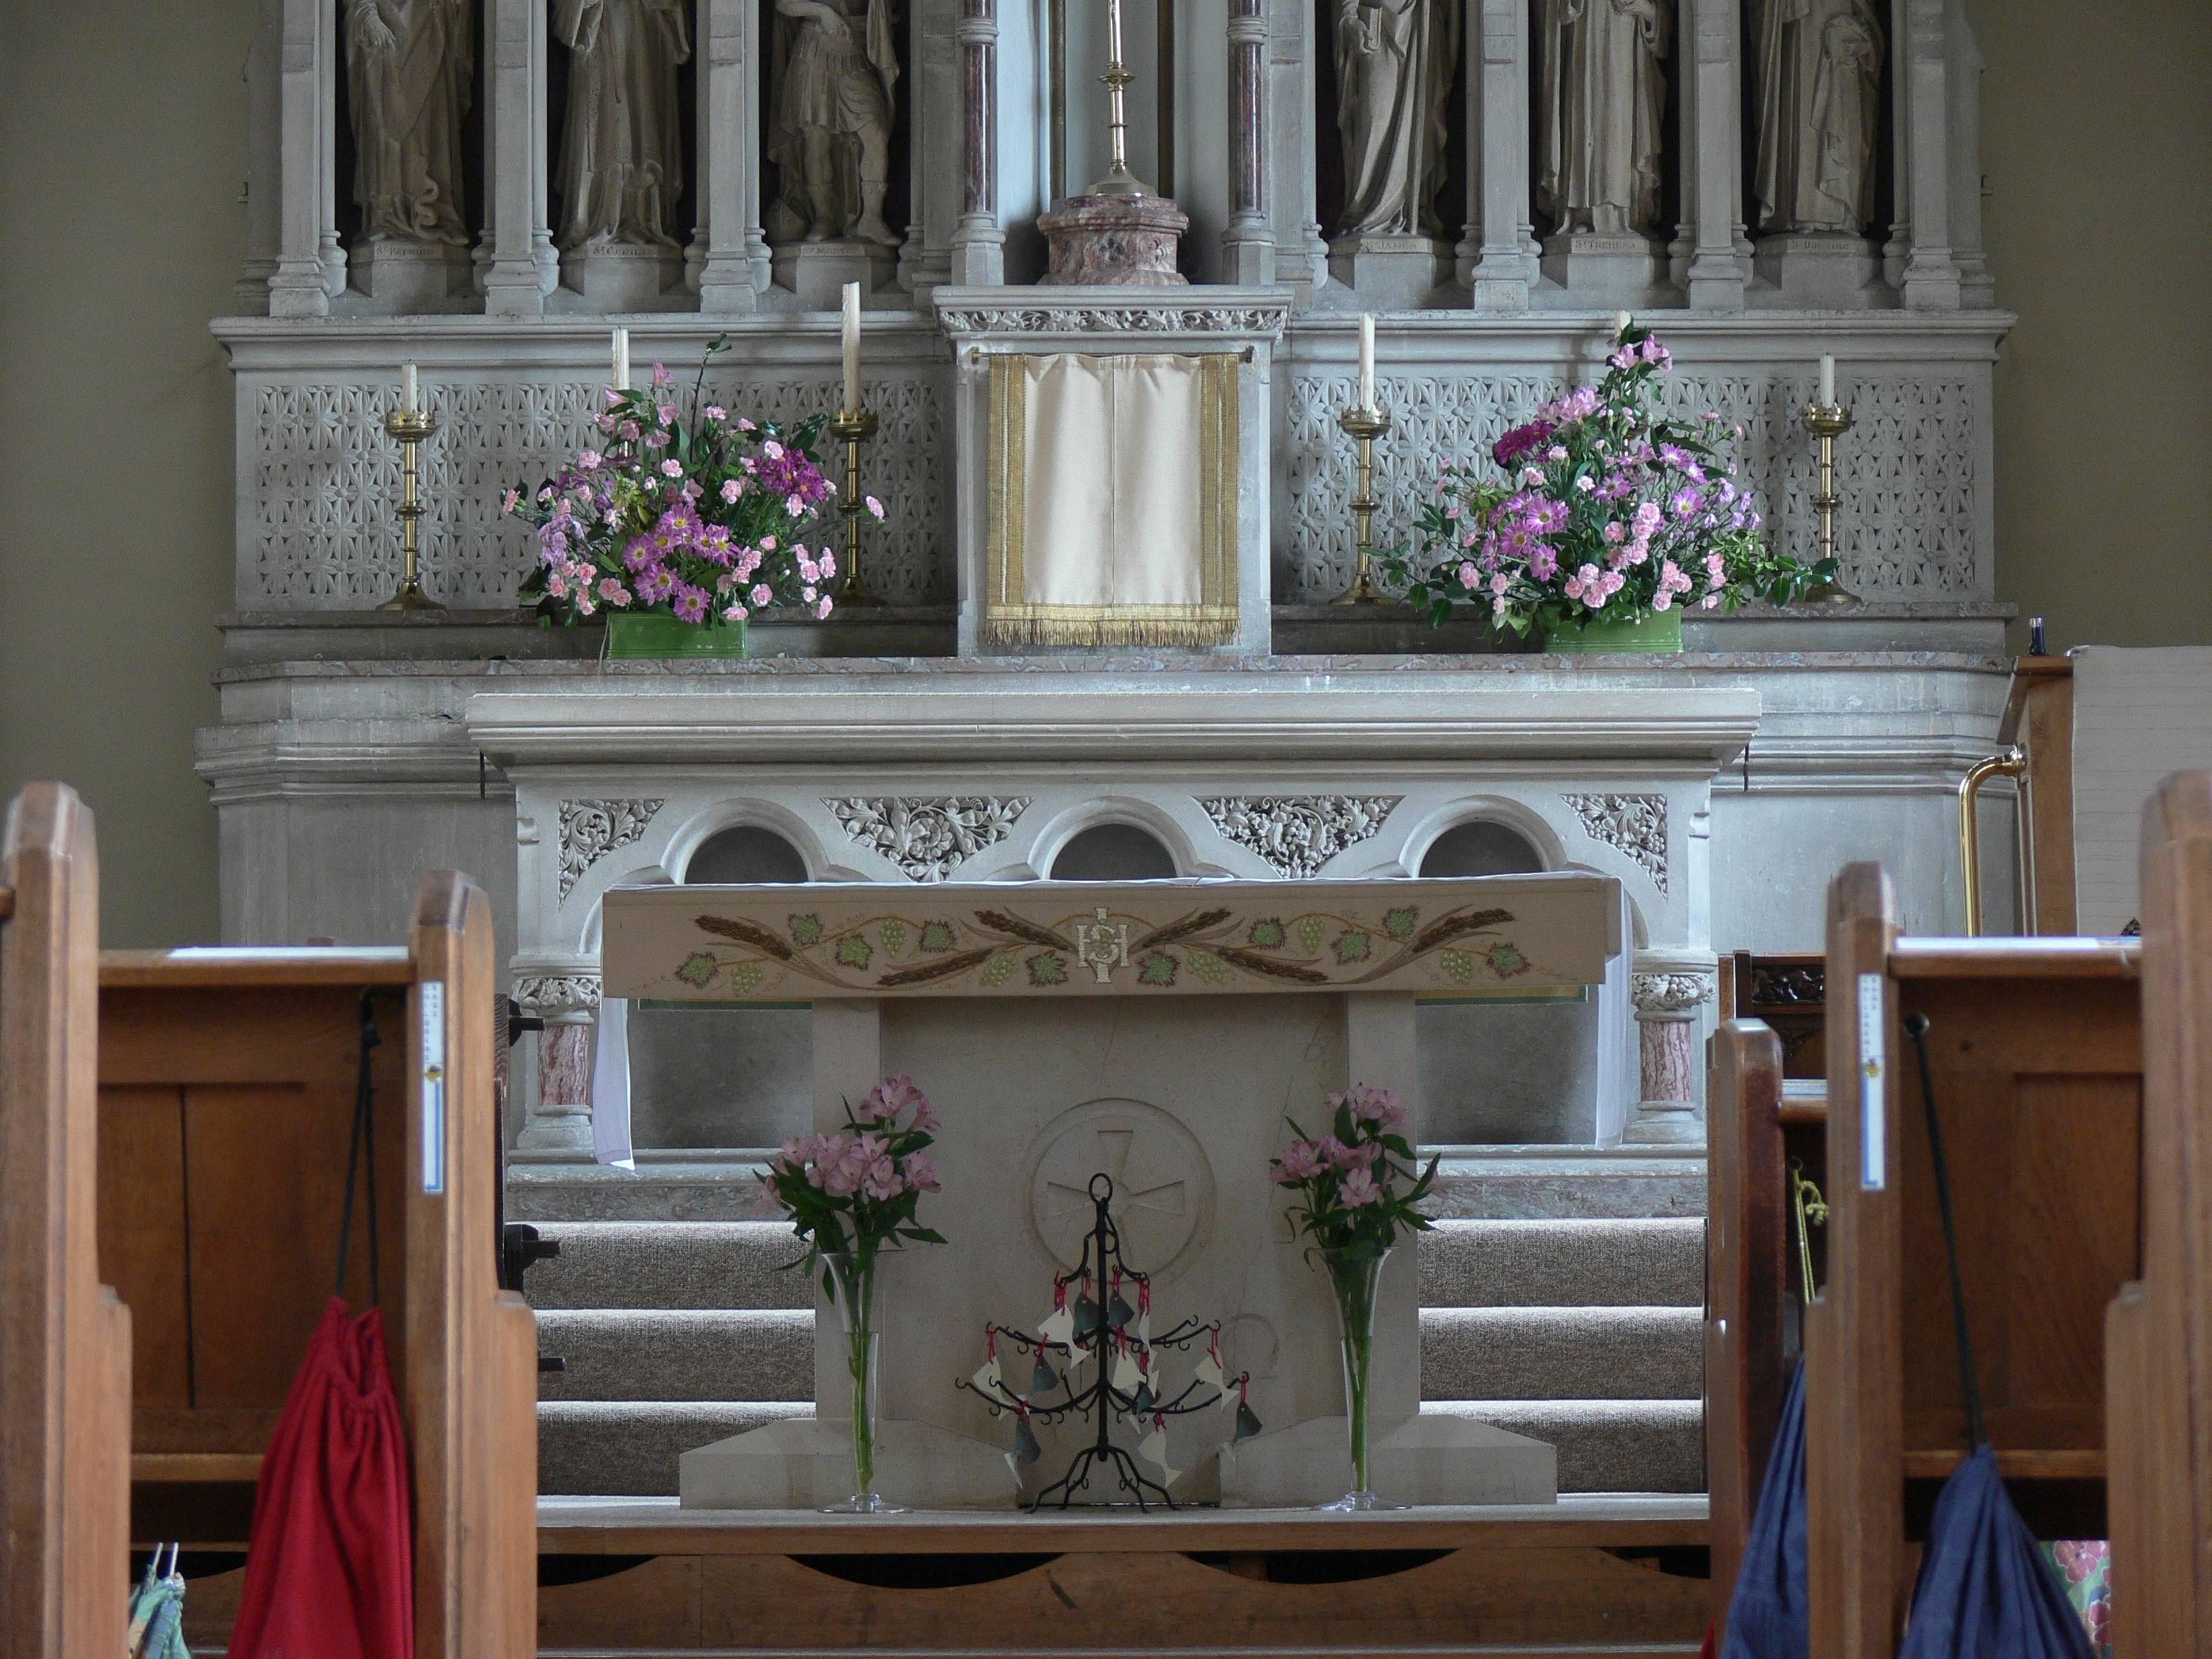 1 St Peter's Church 118